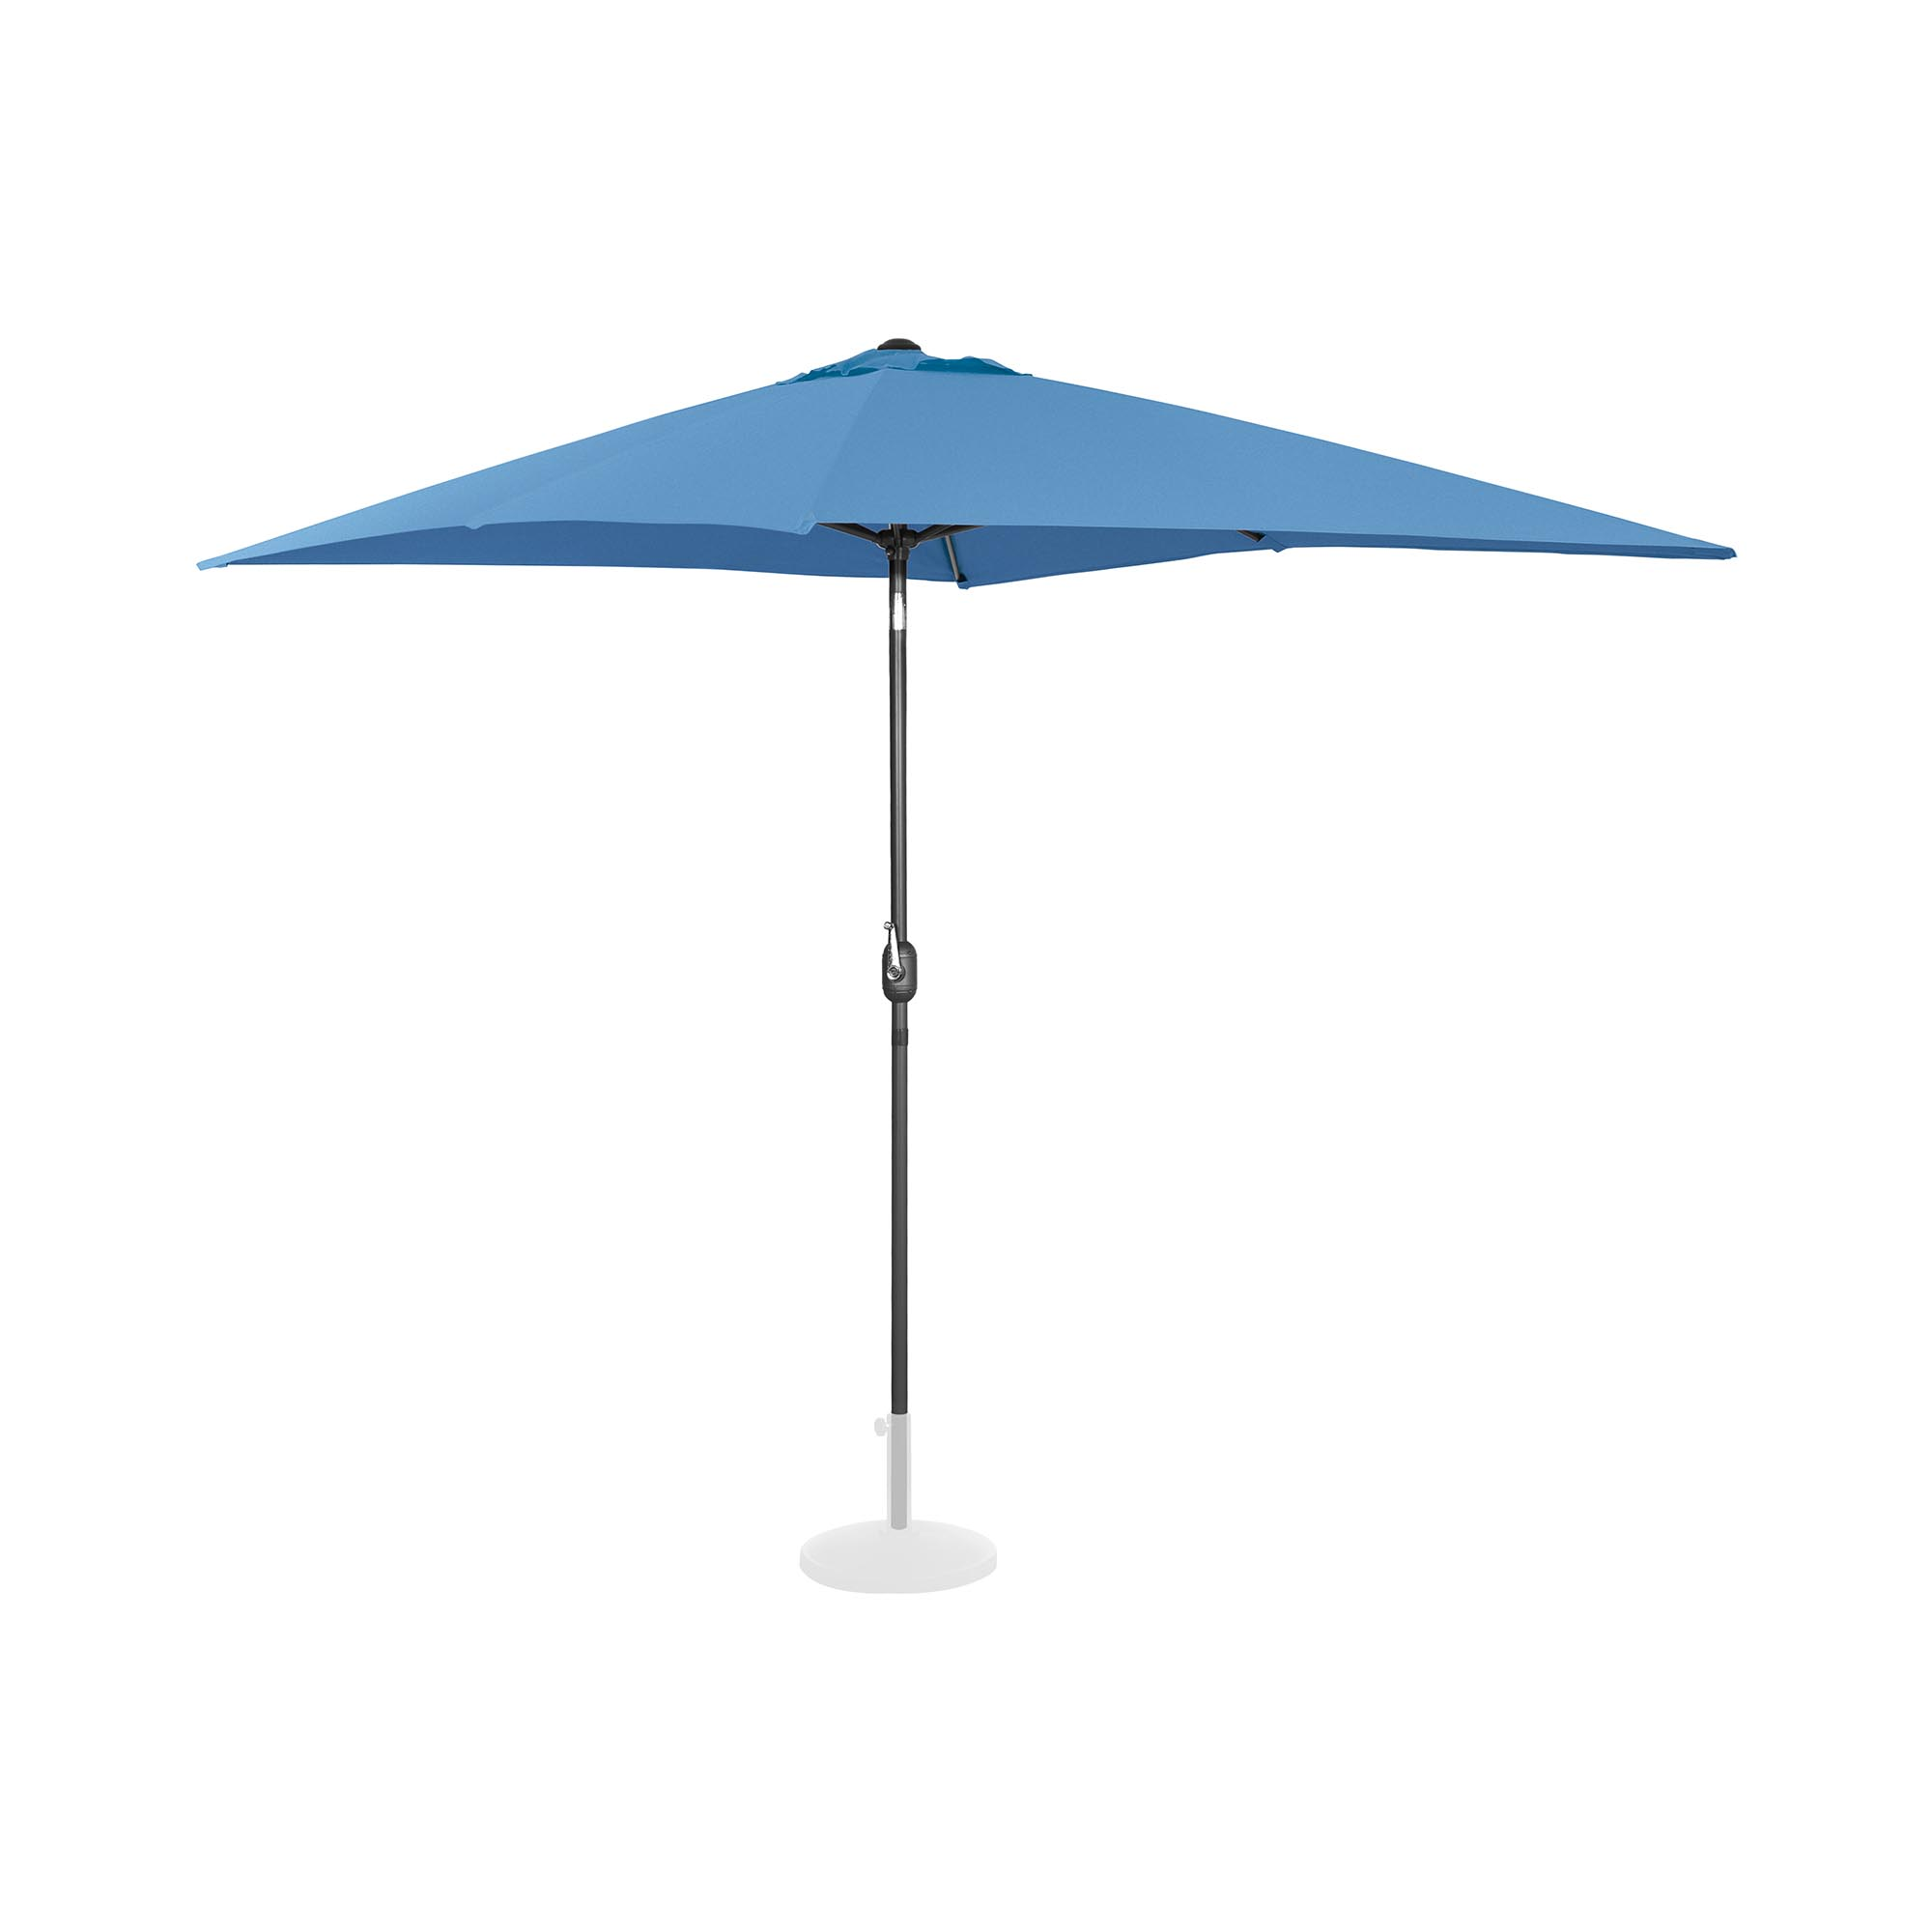 Uniprodo Sonnenschirm groß - blau - rechteckig - 200 x 300 cm - neigbar UNI_UMBRELLA_TSQ2030BL